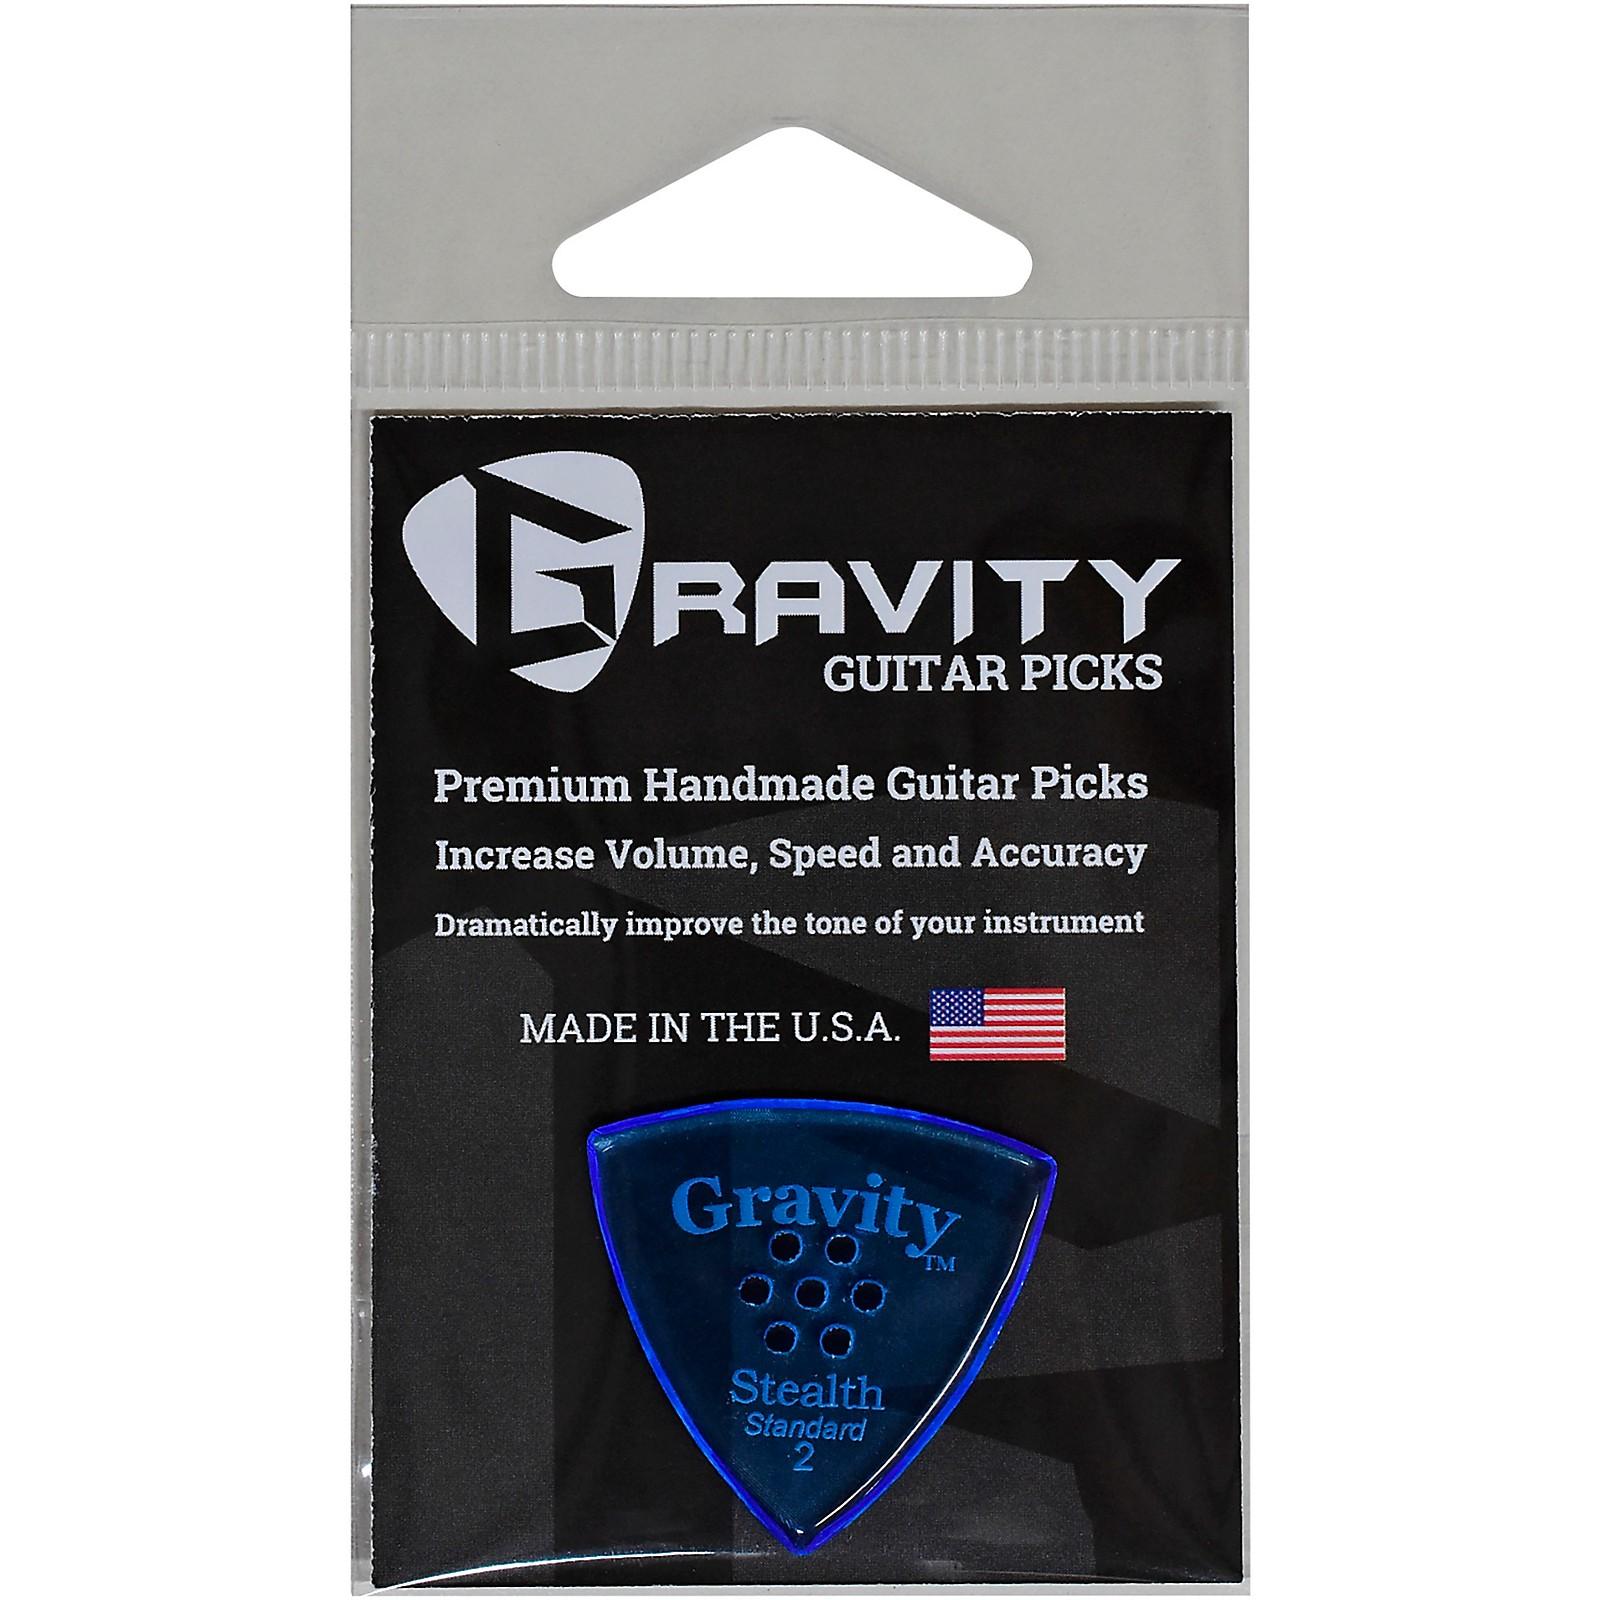 GRAVITY PICKS Stealth Standard Polished Blue Multi-Hole Guitar Picks